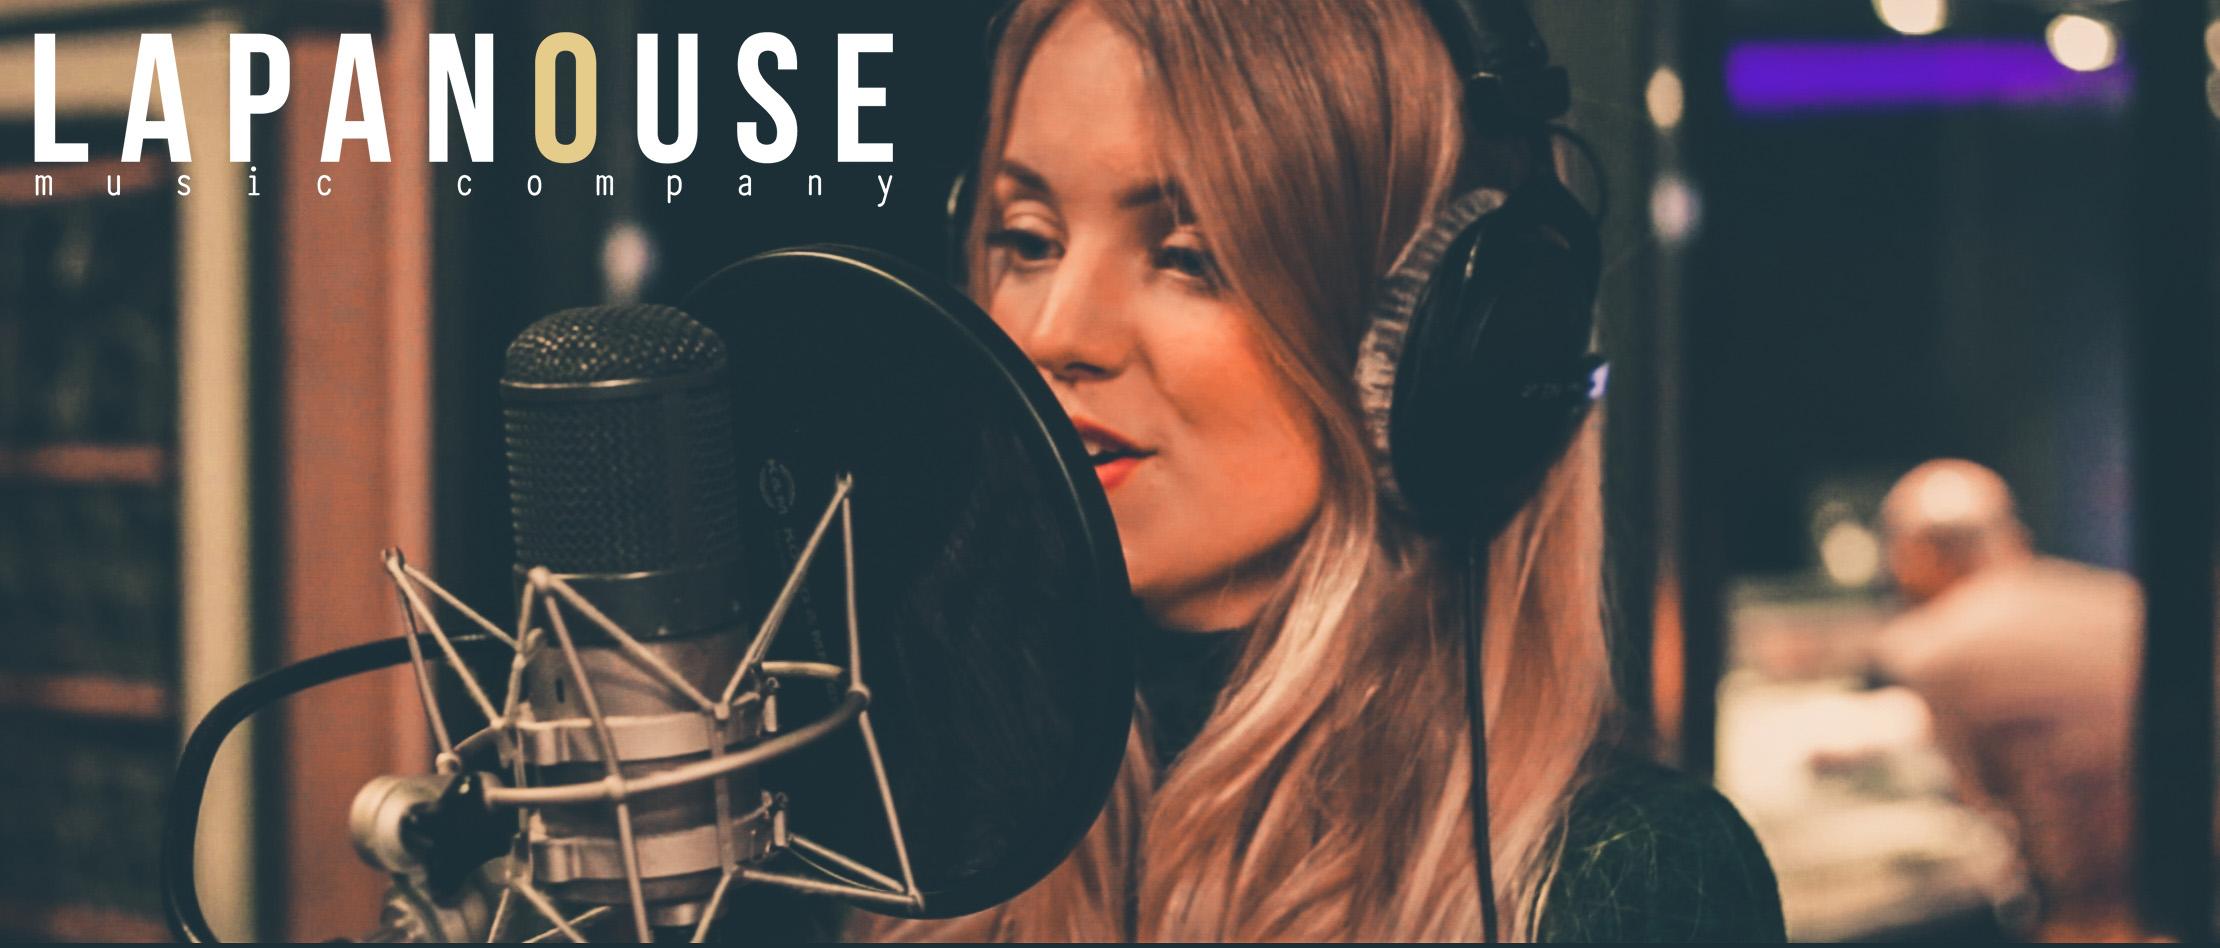 Lisa Imhoff @ Lapanouse Music